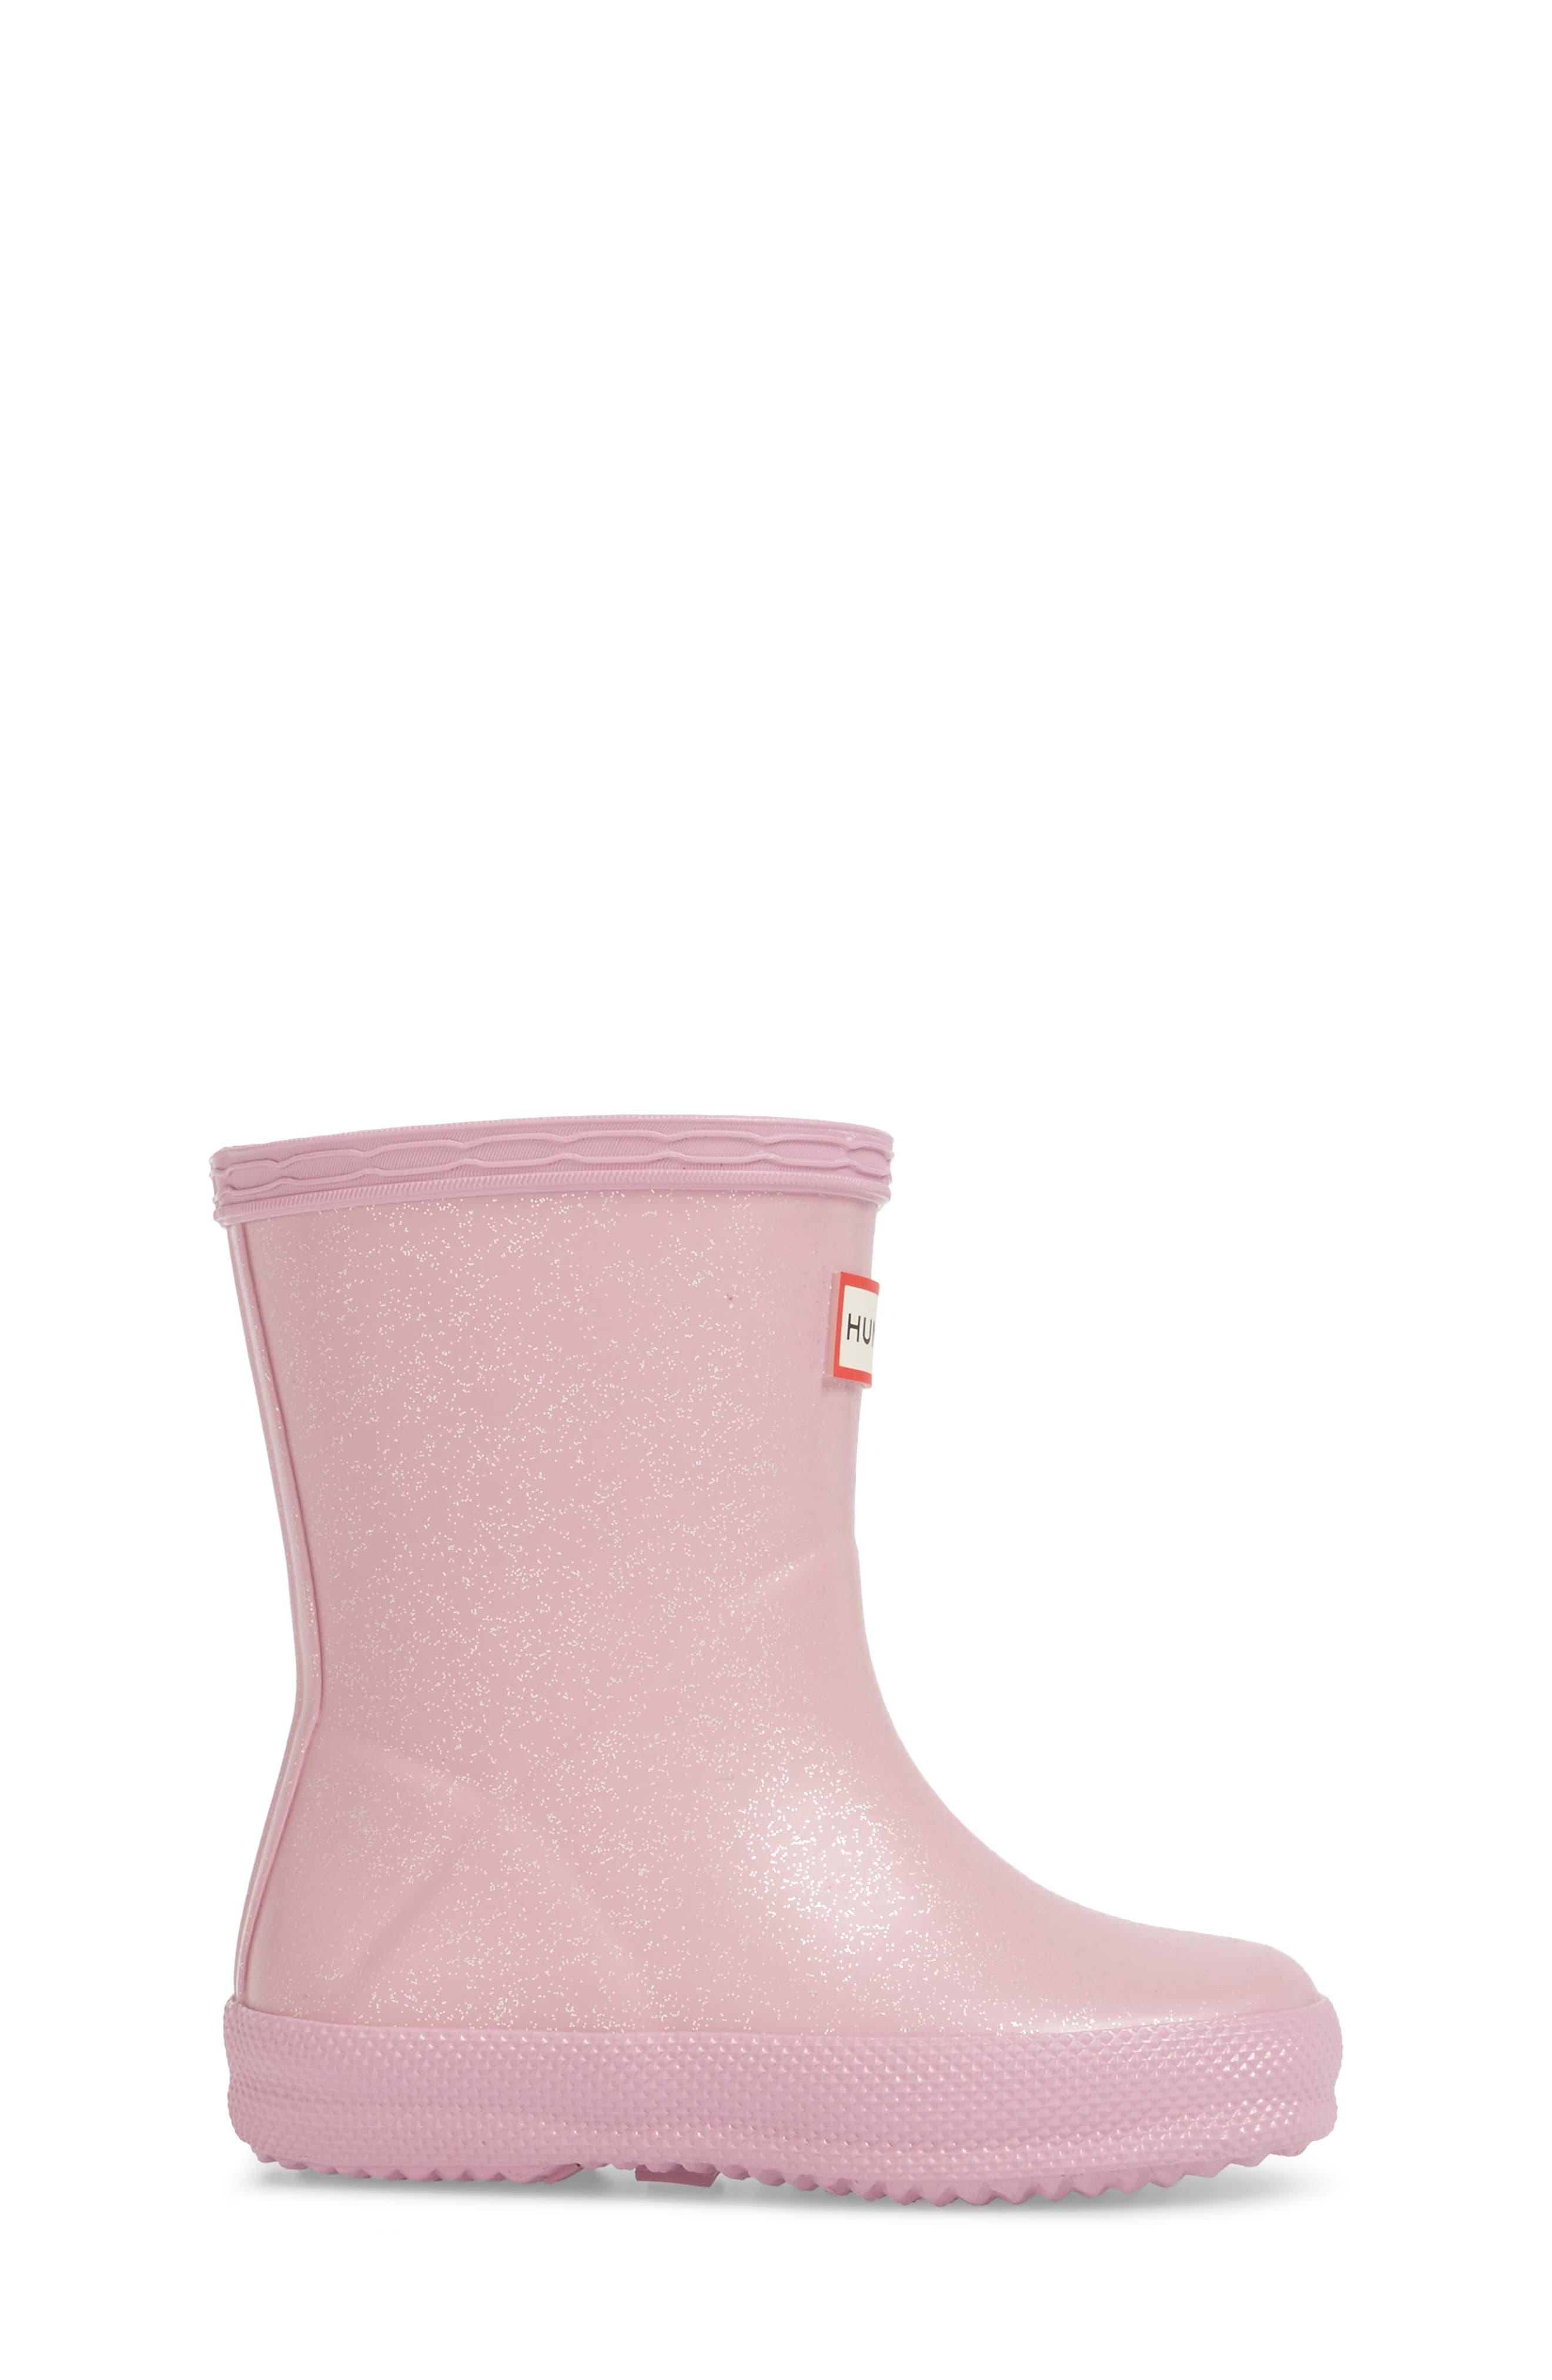 'First Classic' Glitter Rain Boot,                             Alternate thumbnail 3, color,                             Blossom